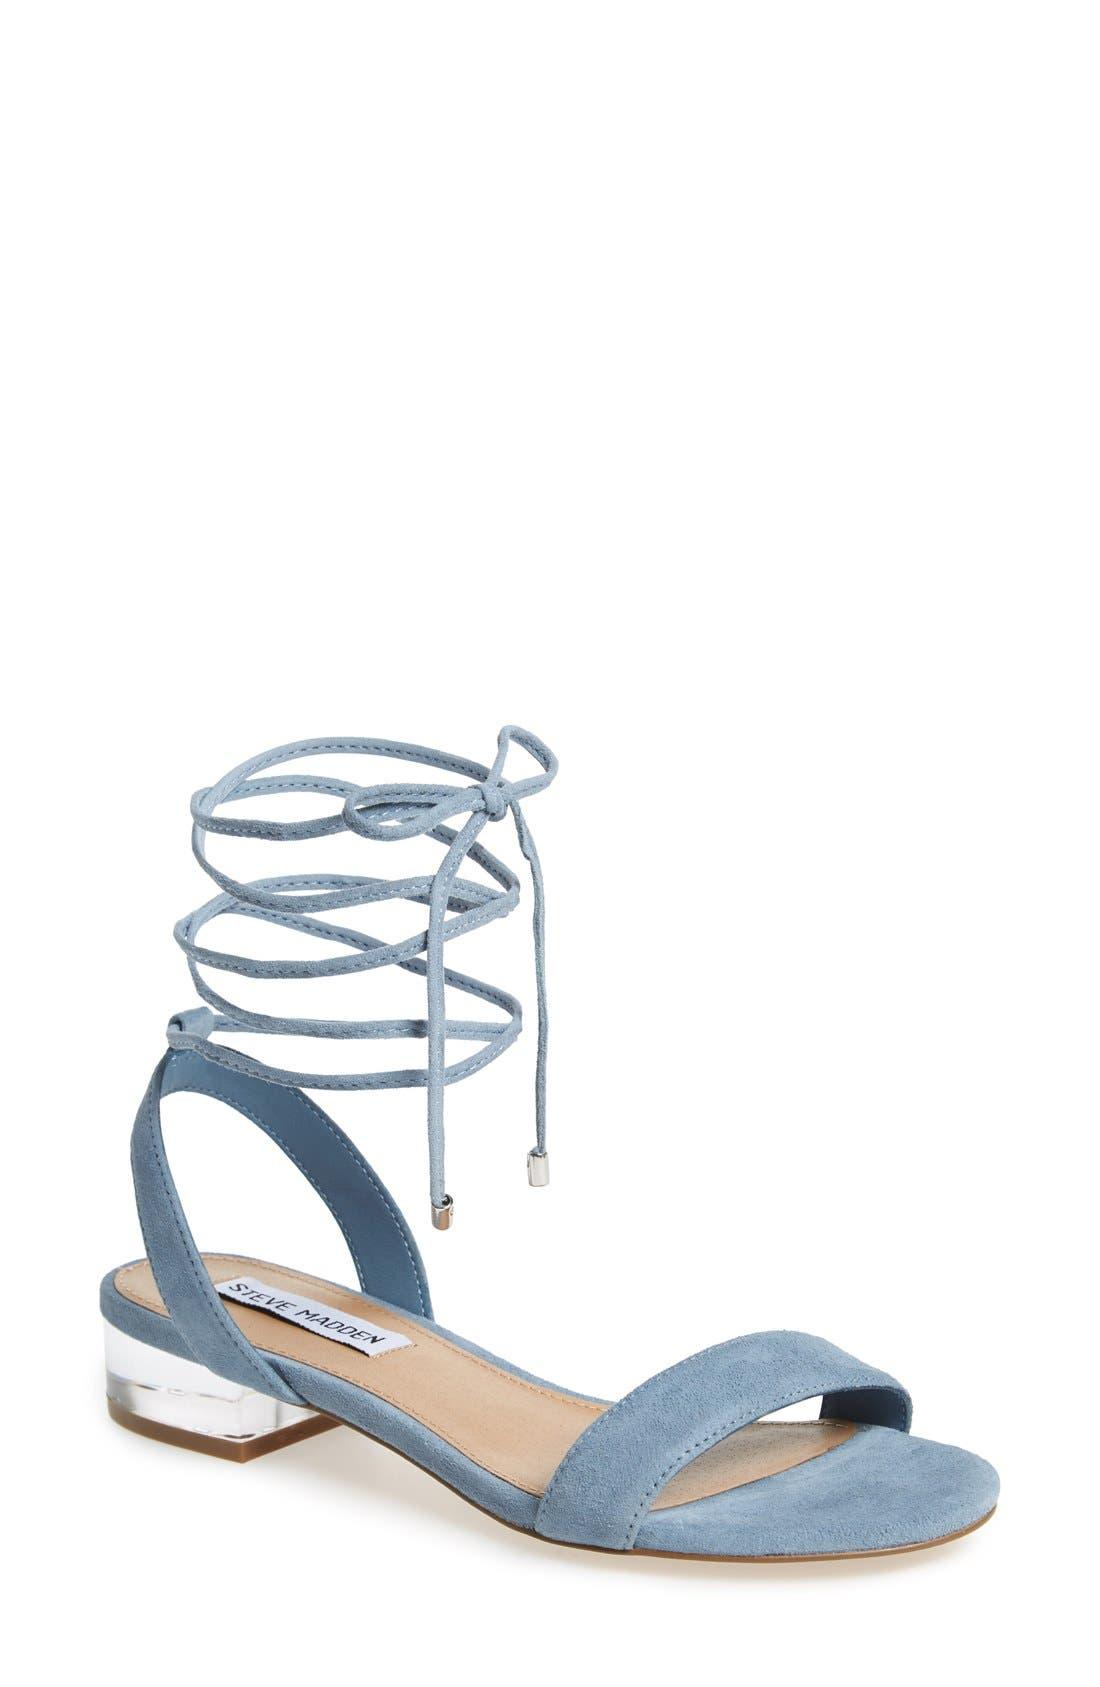 'Carolyn' Lace-Up Sandal,                             Main thumbnail 3, color,